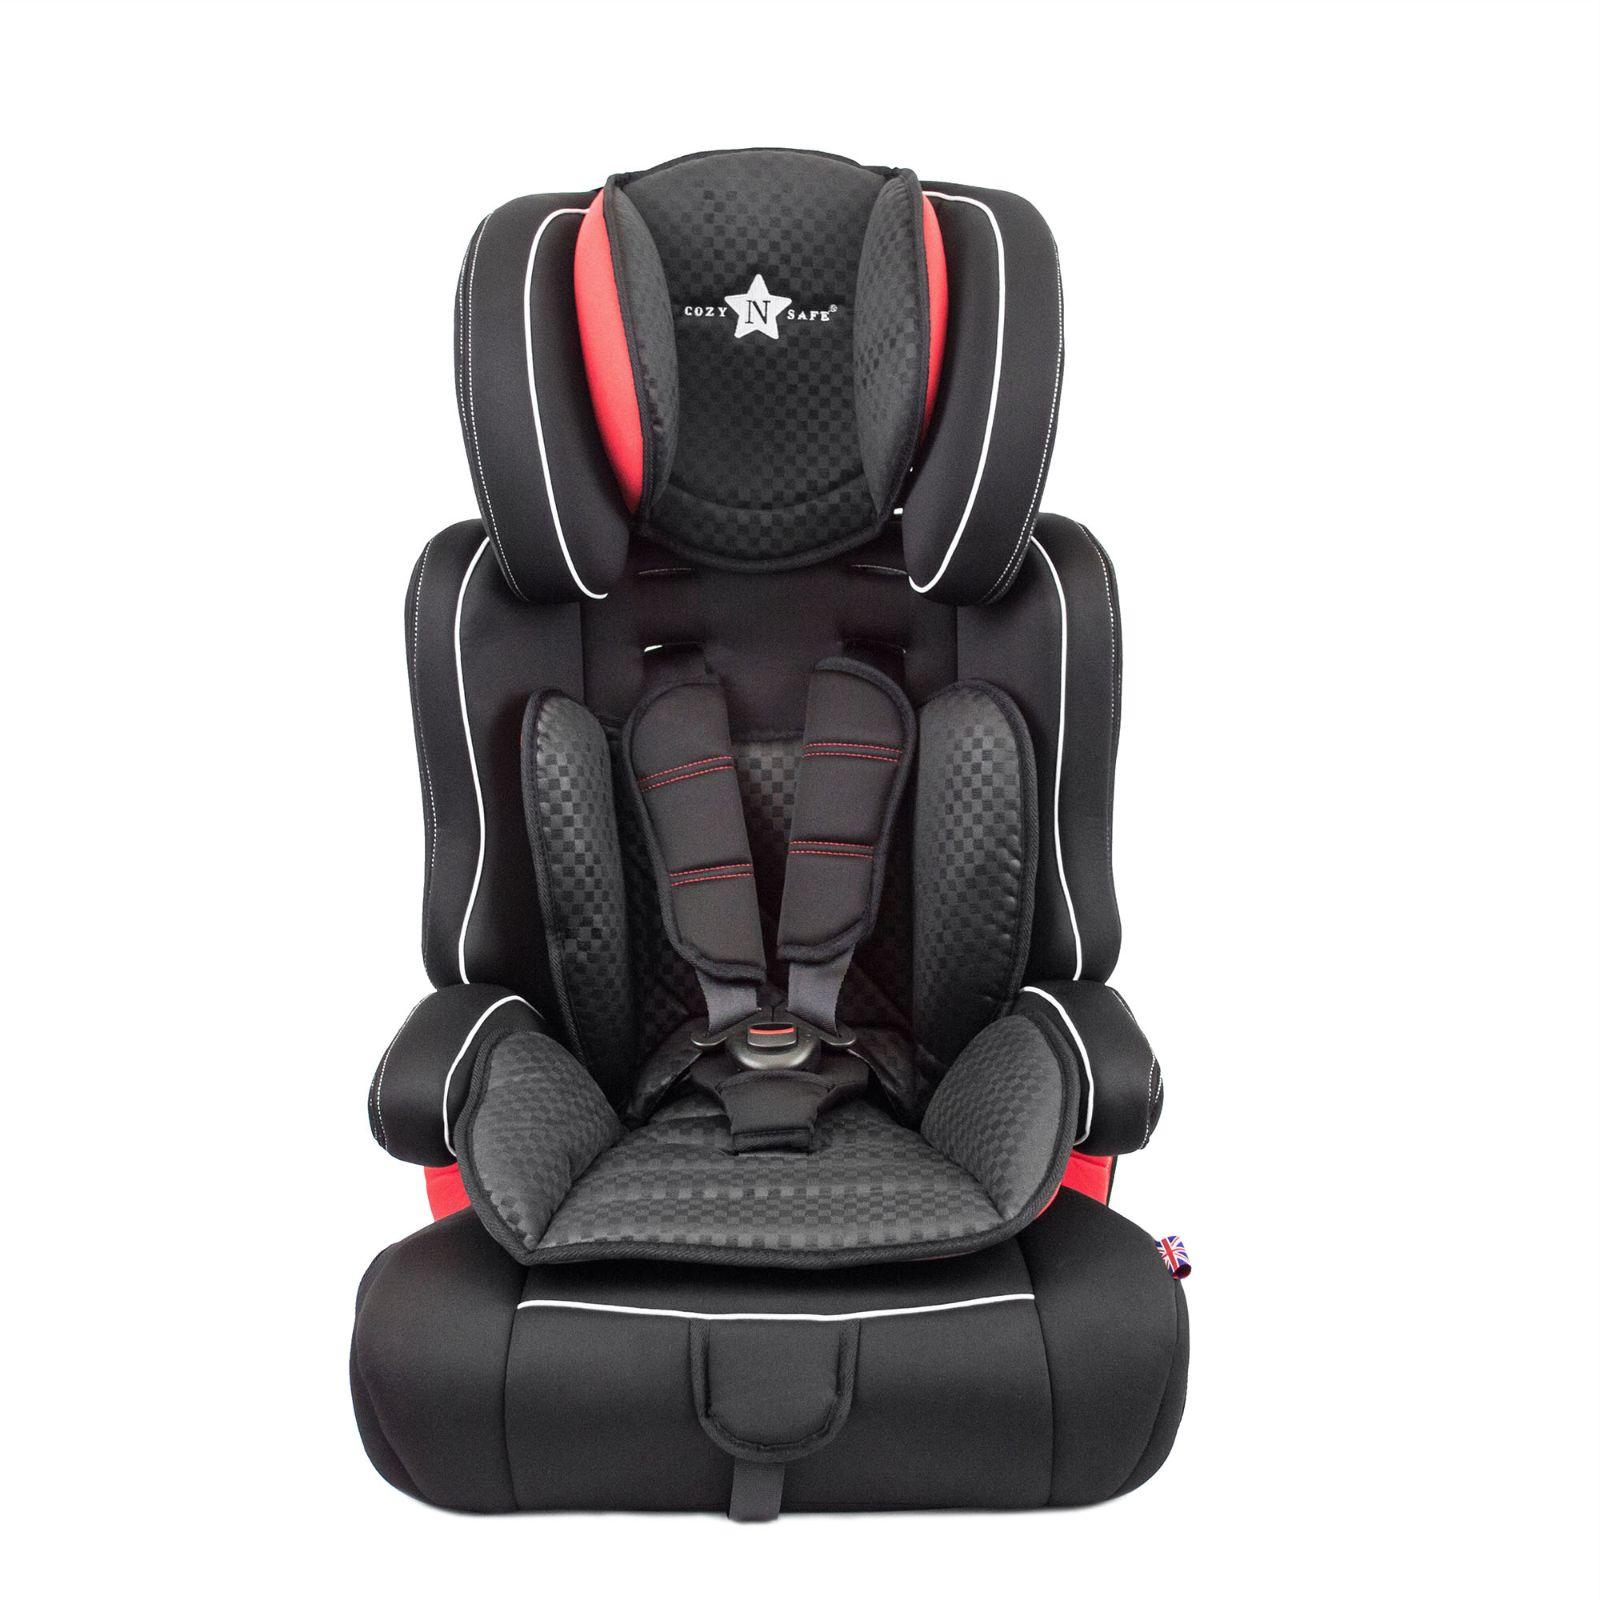 514255c5e3b4 Cozy N Safe Everest Group 1 2 3 Car Seat - Black   Red